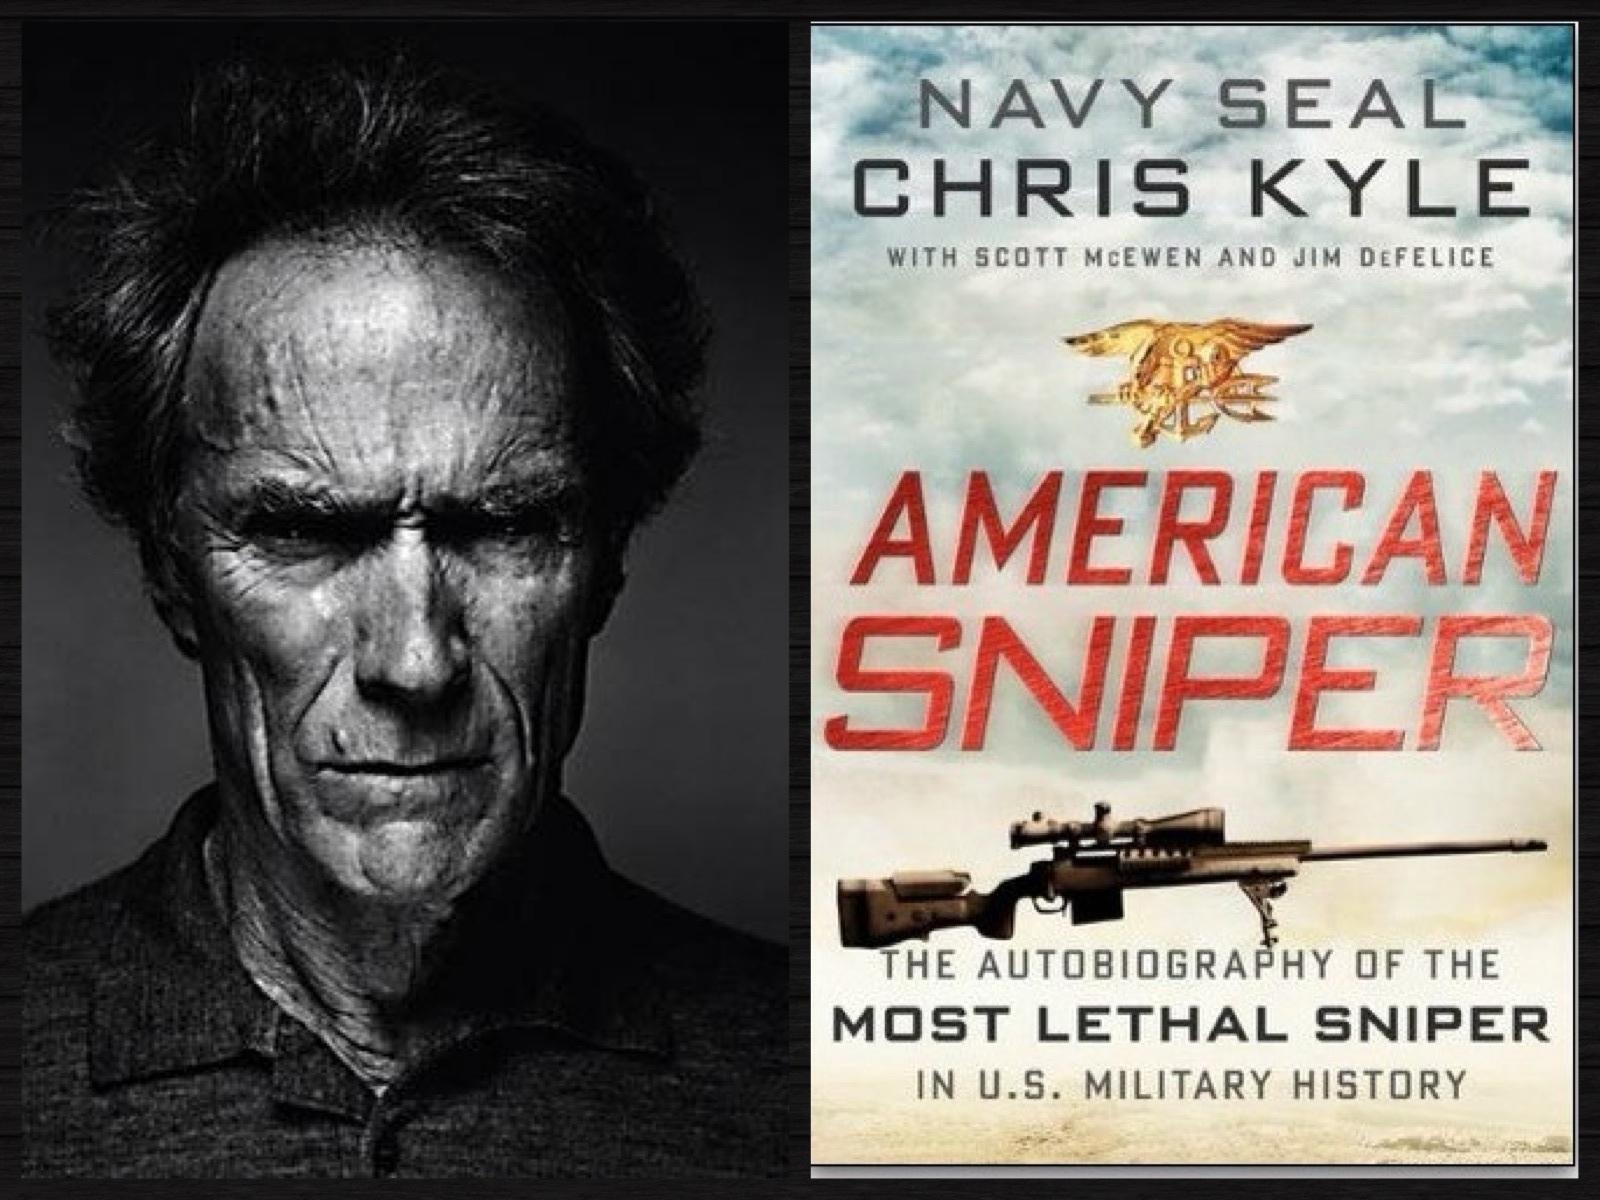 American Sniper Visage